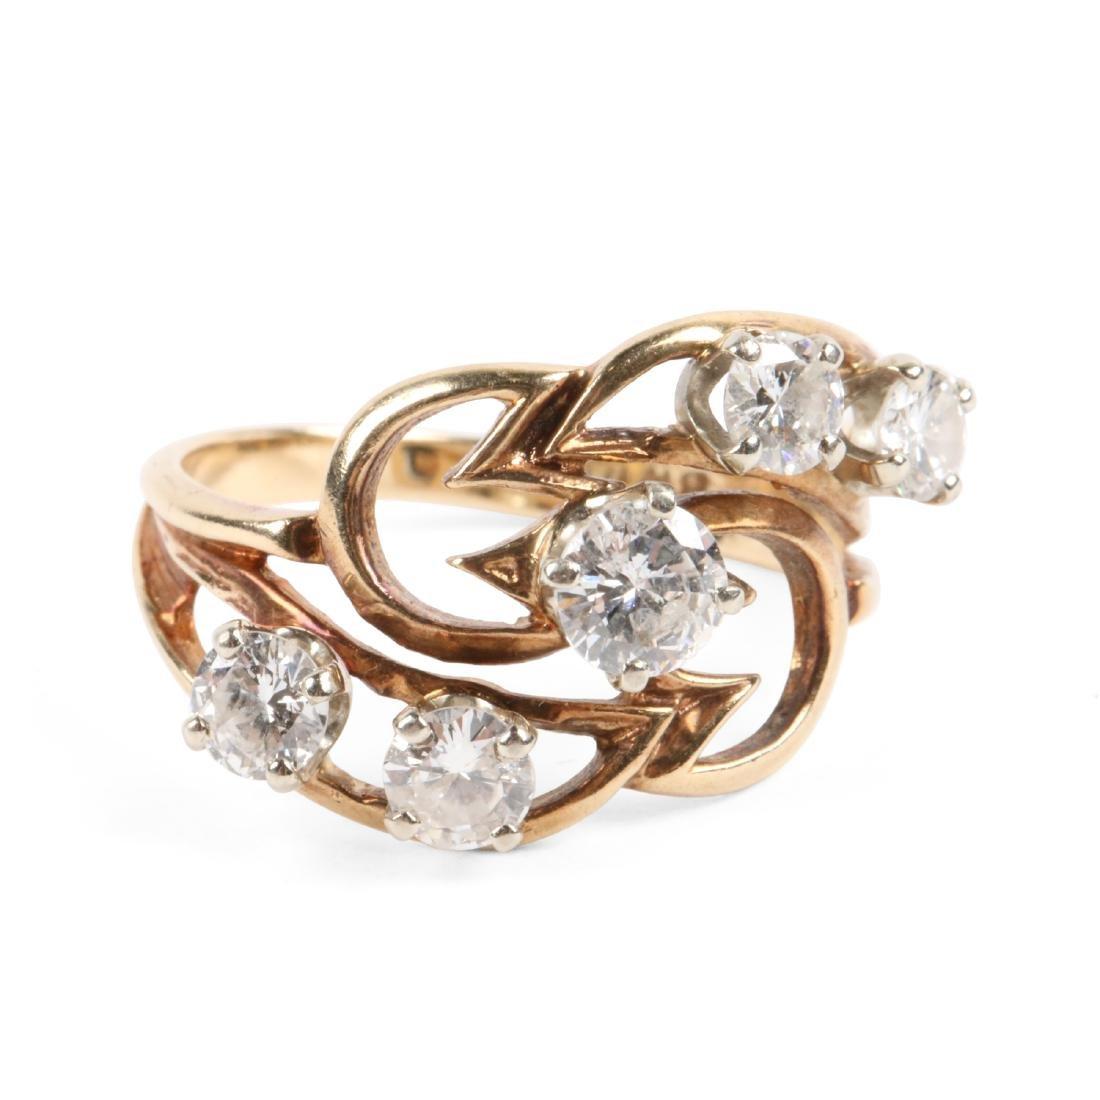 A 10K Gold, Diamond Ring